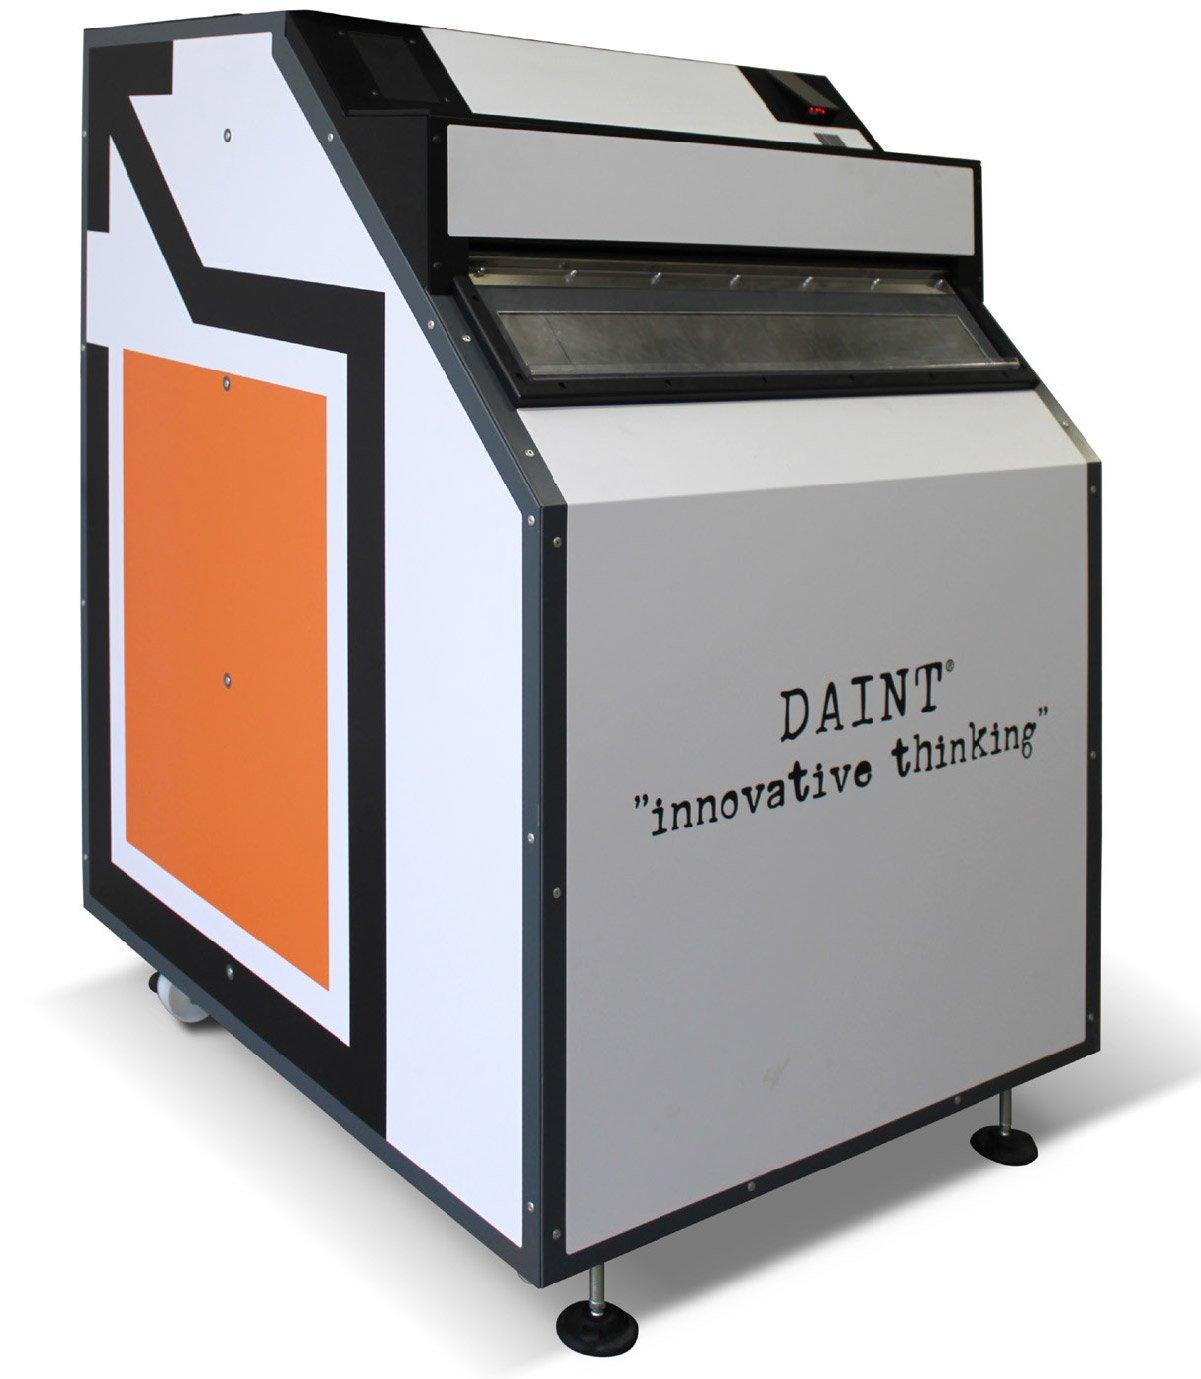 DPIMAT24 - Daint srl Distributori Automatici